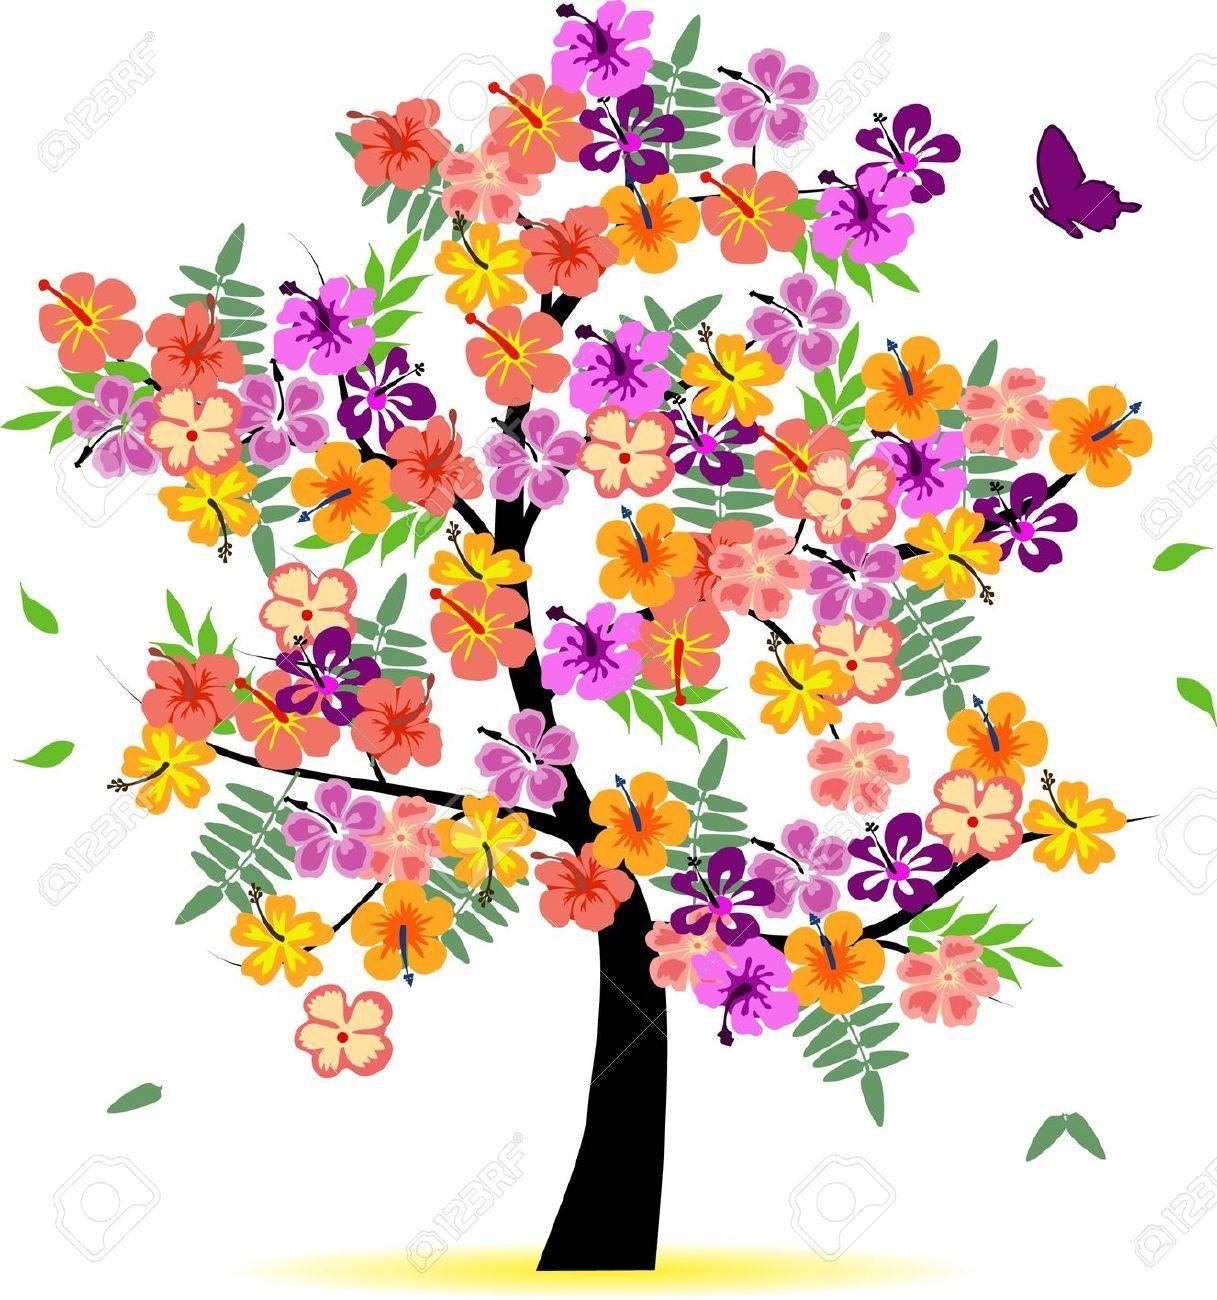 Printemps image recherche google printemps - Dessin de printemps ...